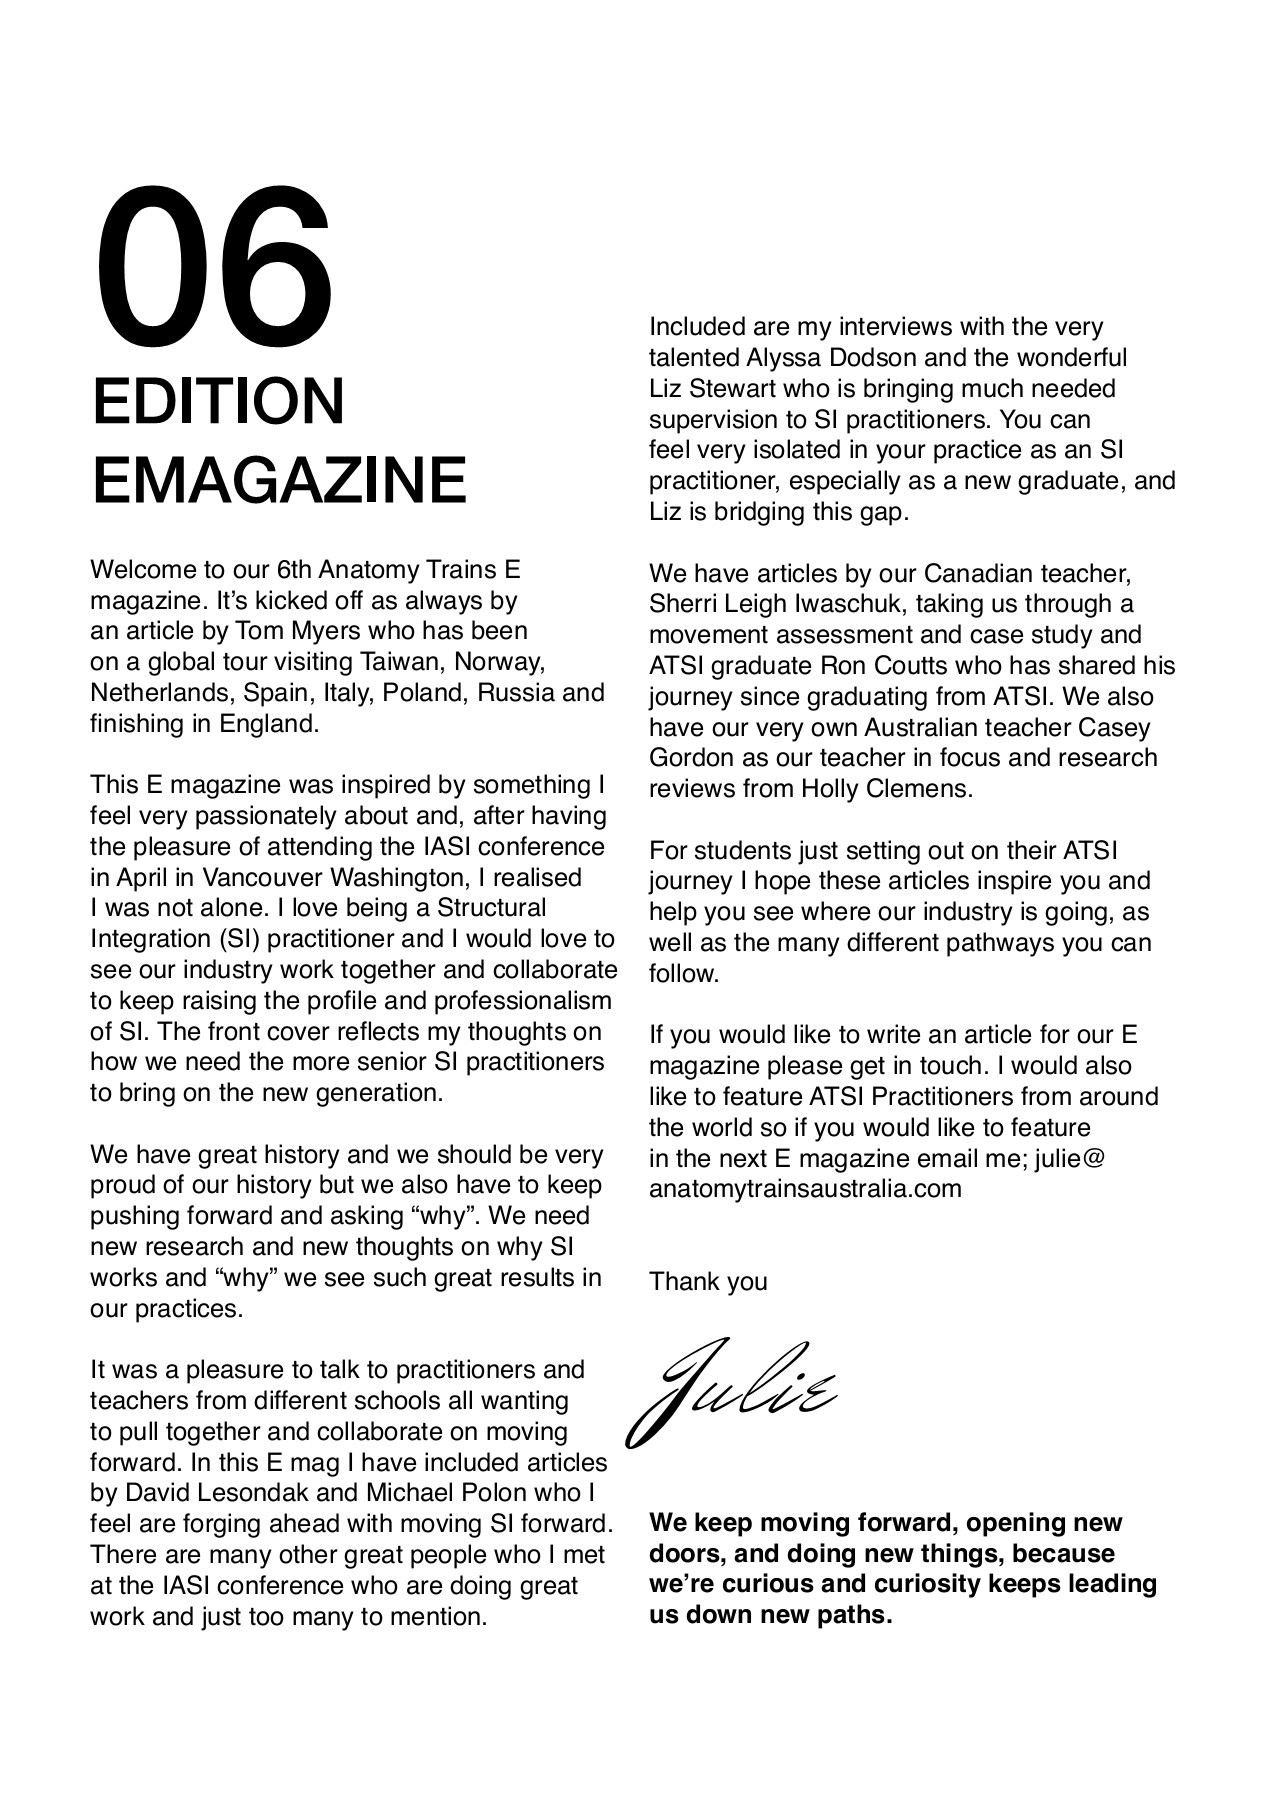 Anatomy Trains Australia eMagazine Issue 6 - Anatomy Trains